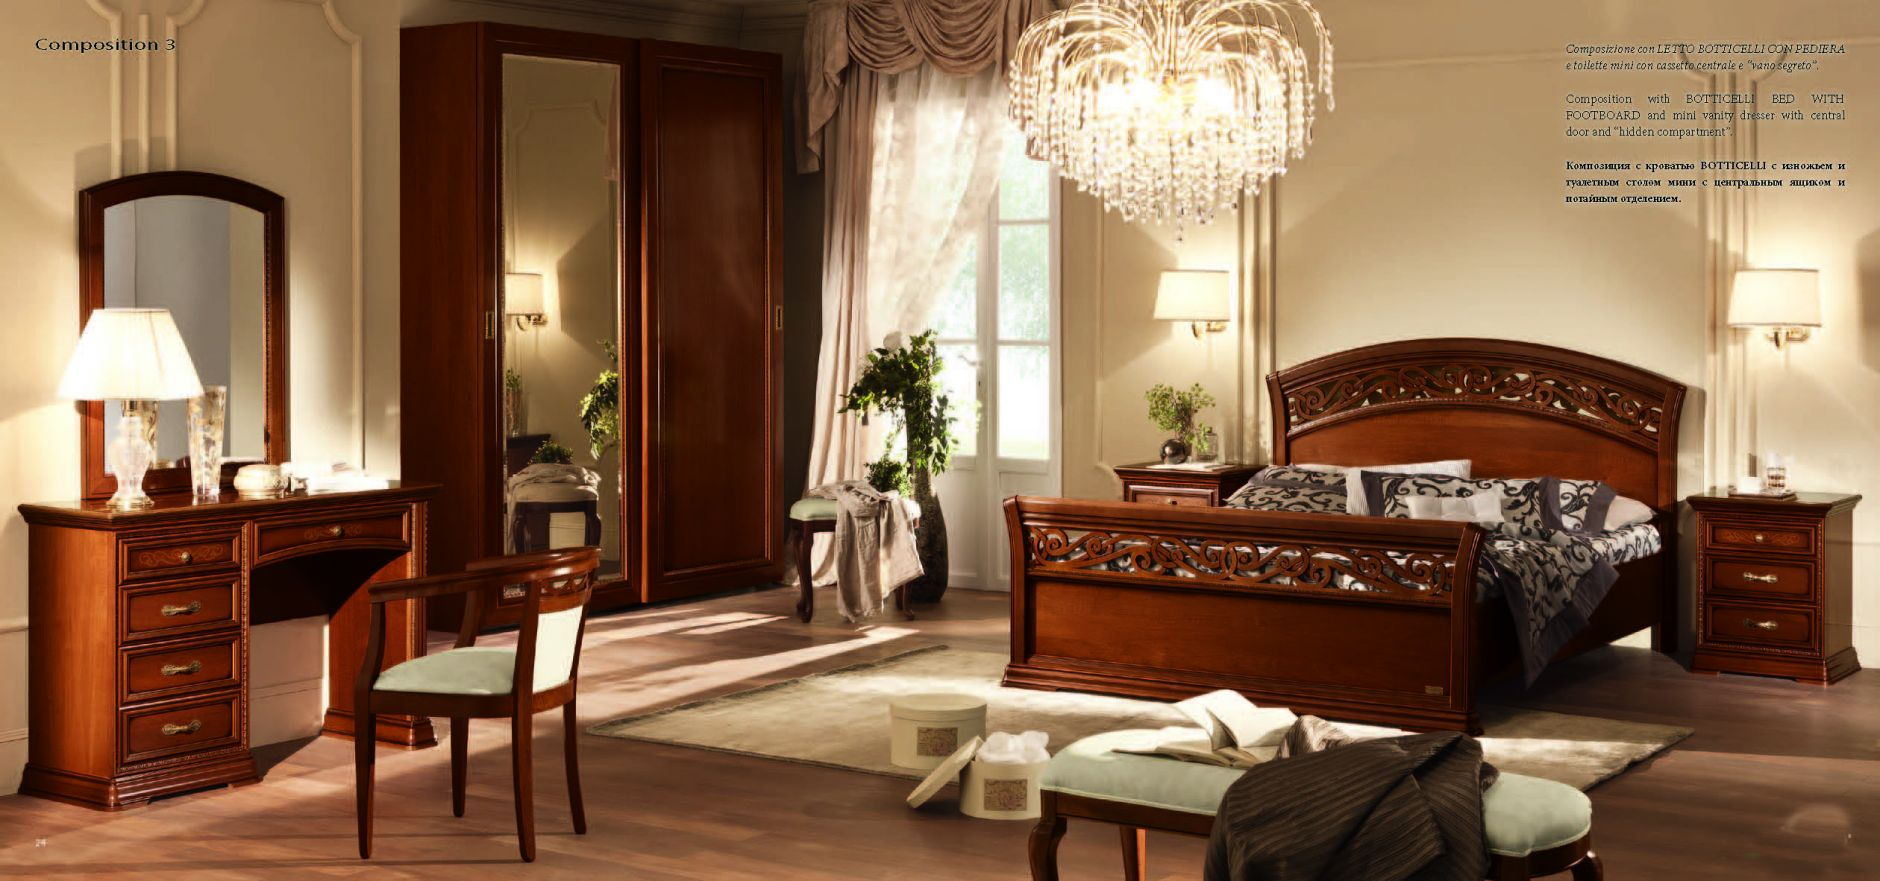 Meubles classiques chambre coucher camelgroup s rie for Chambre 13 serie